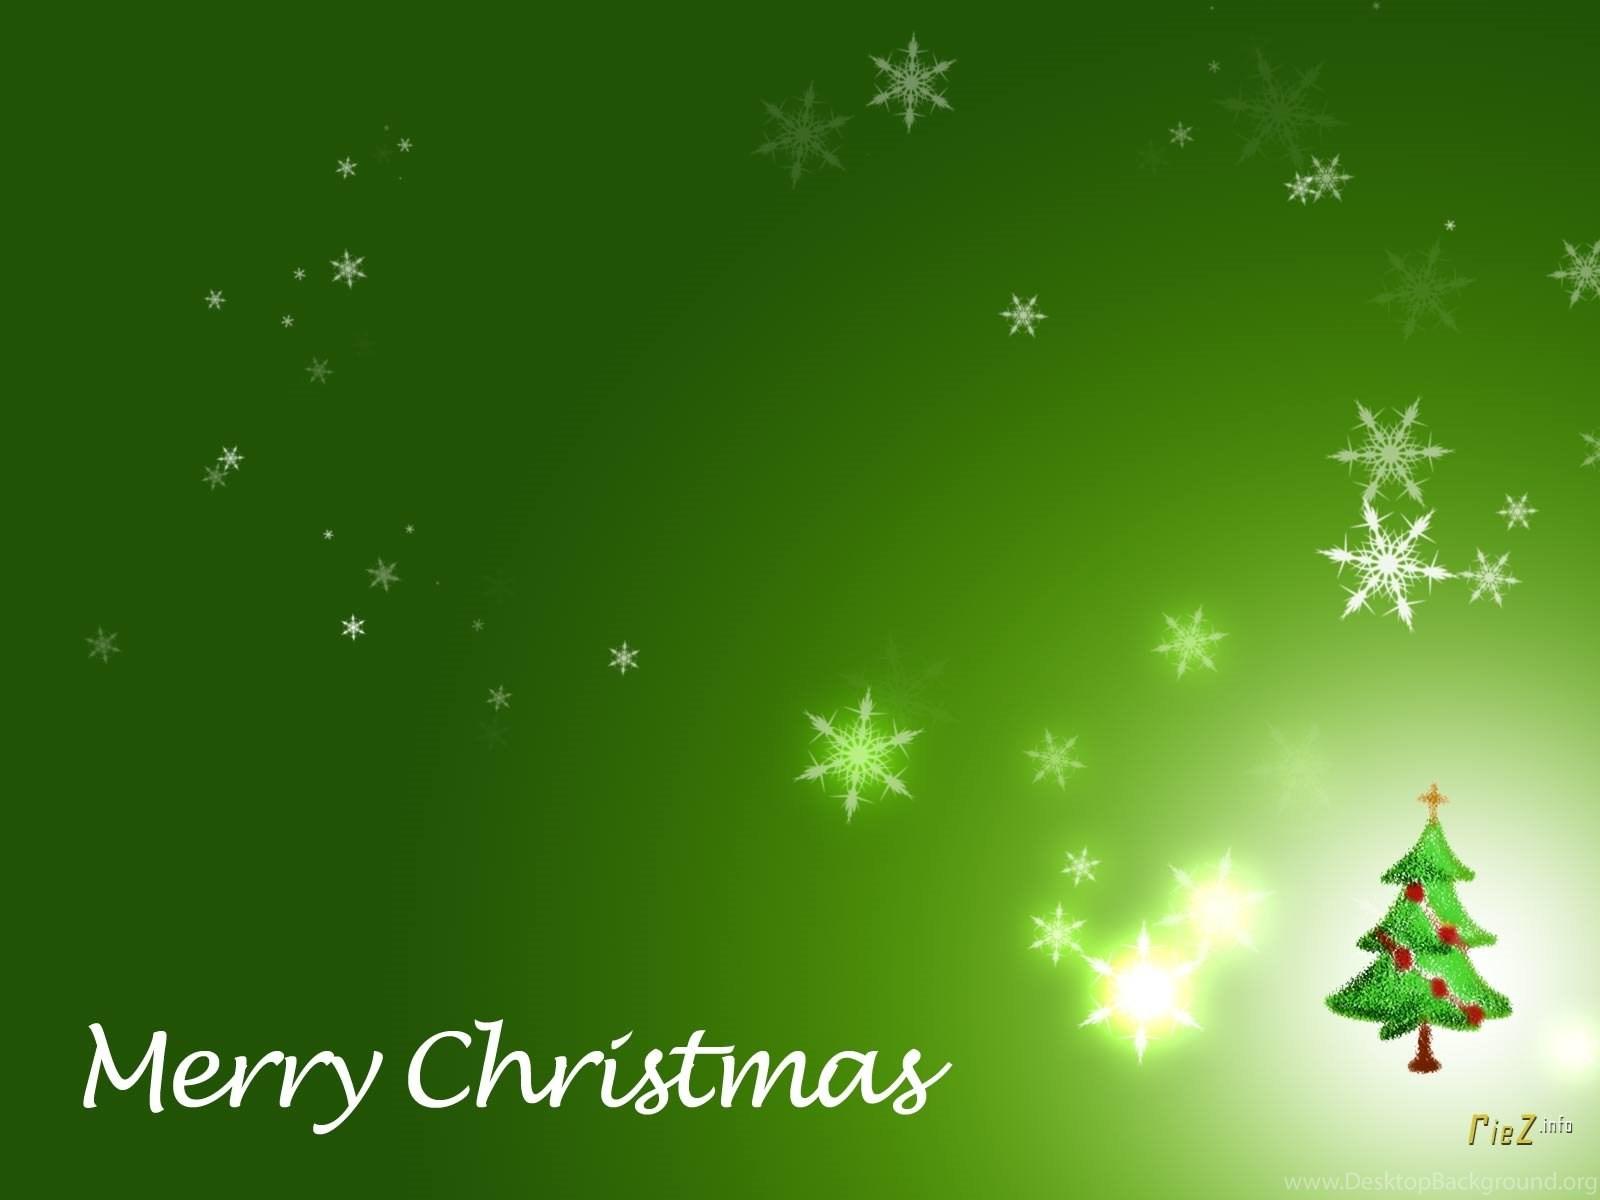 merry christmas backgrounds powerpoint desktop background